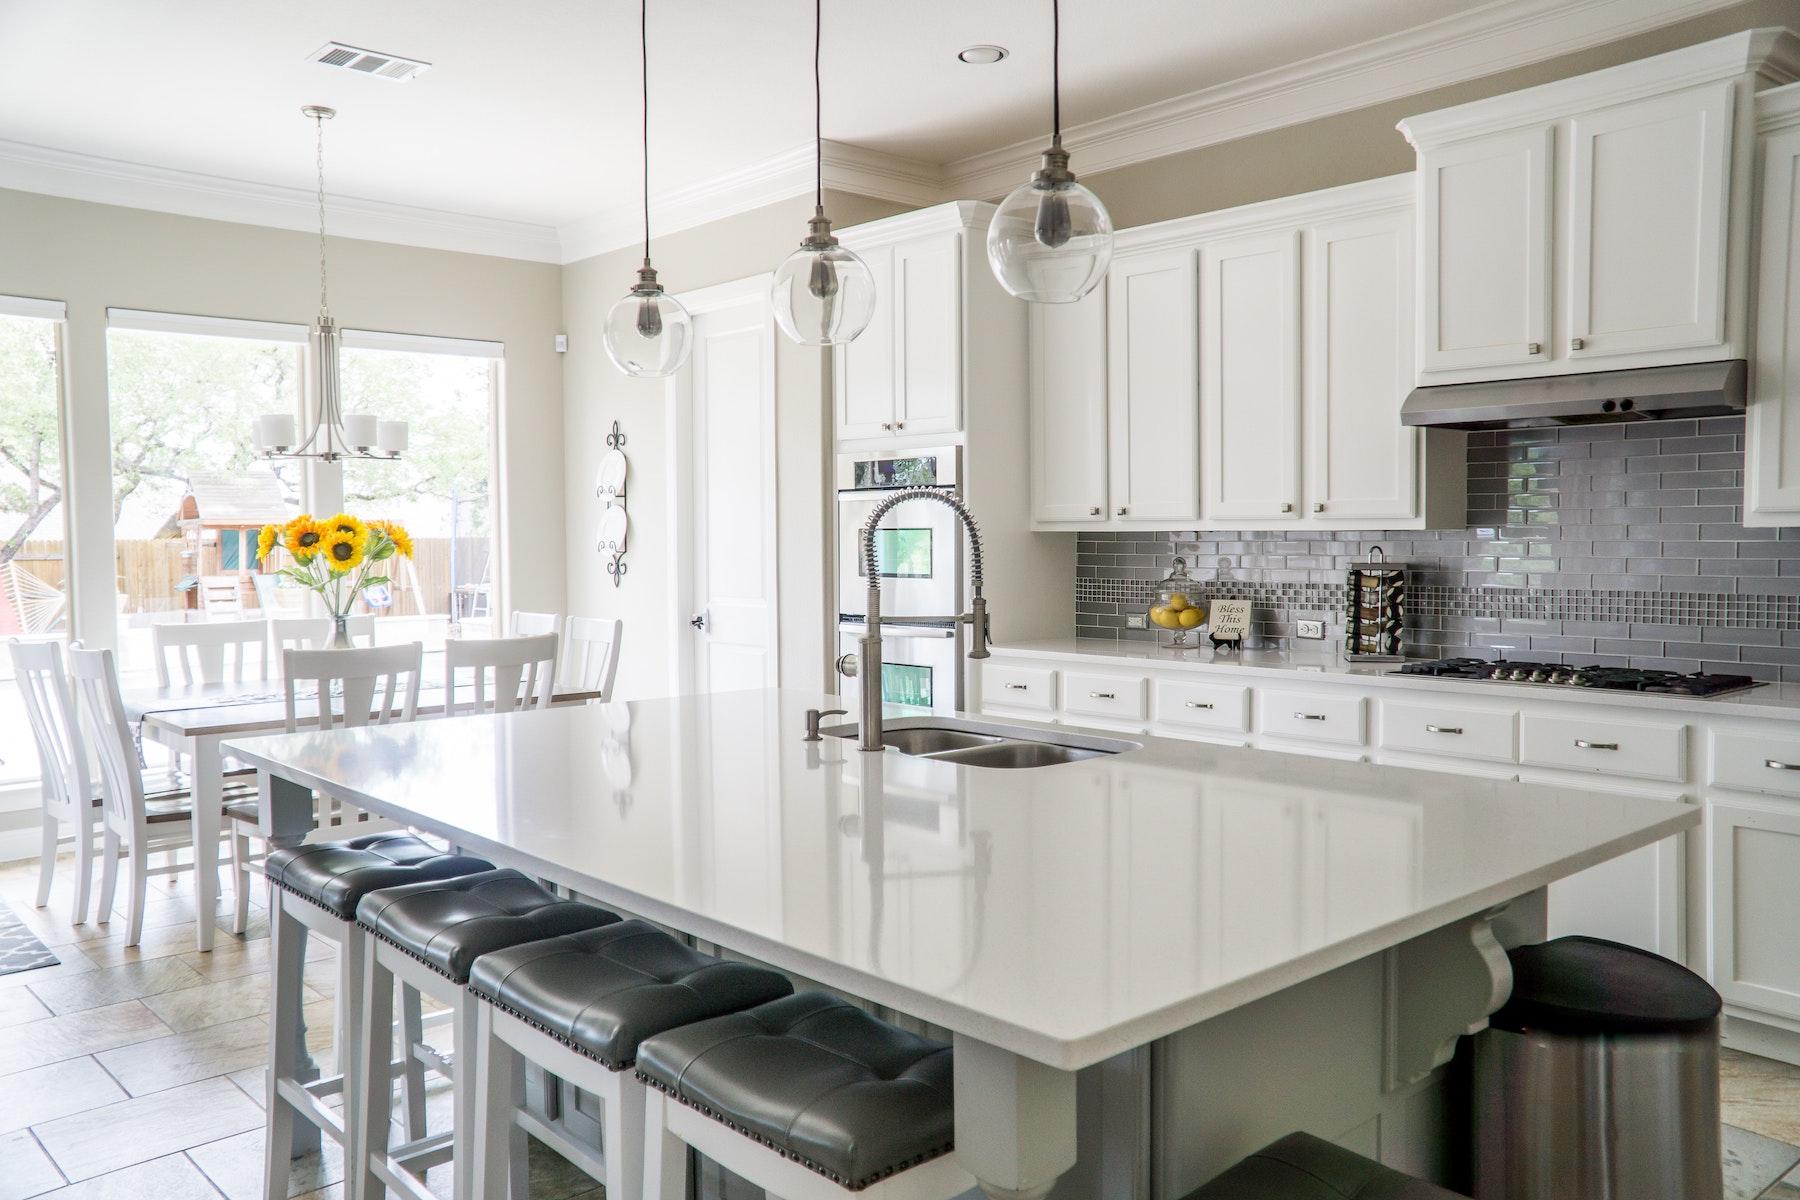 Comment Installer Un Comptoir De Cuisine comptoir de cuisine; comment choisir entre bois, inox